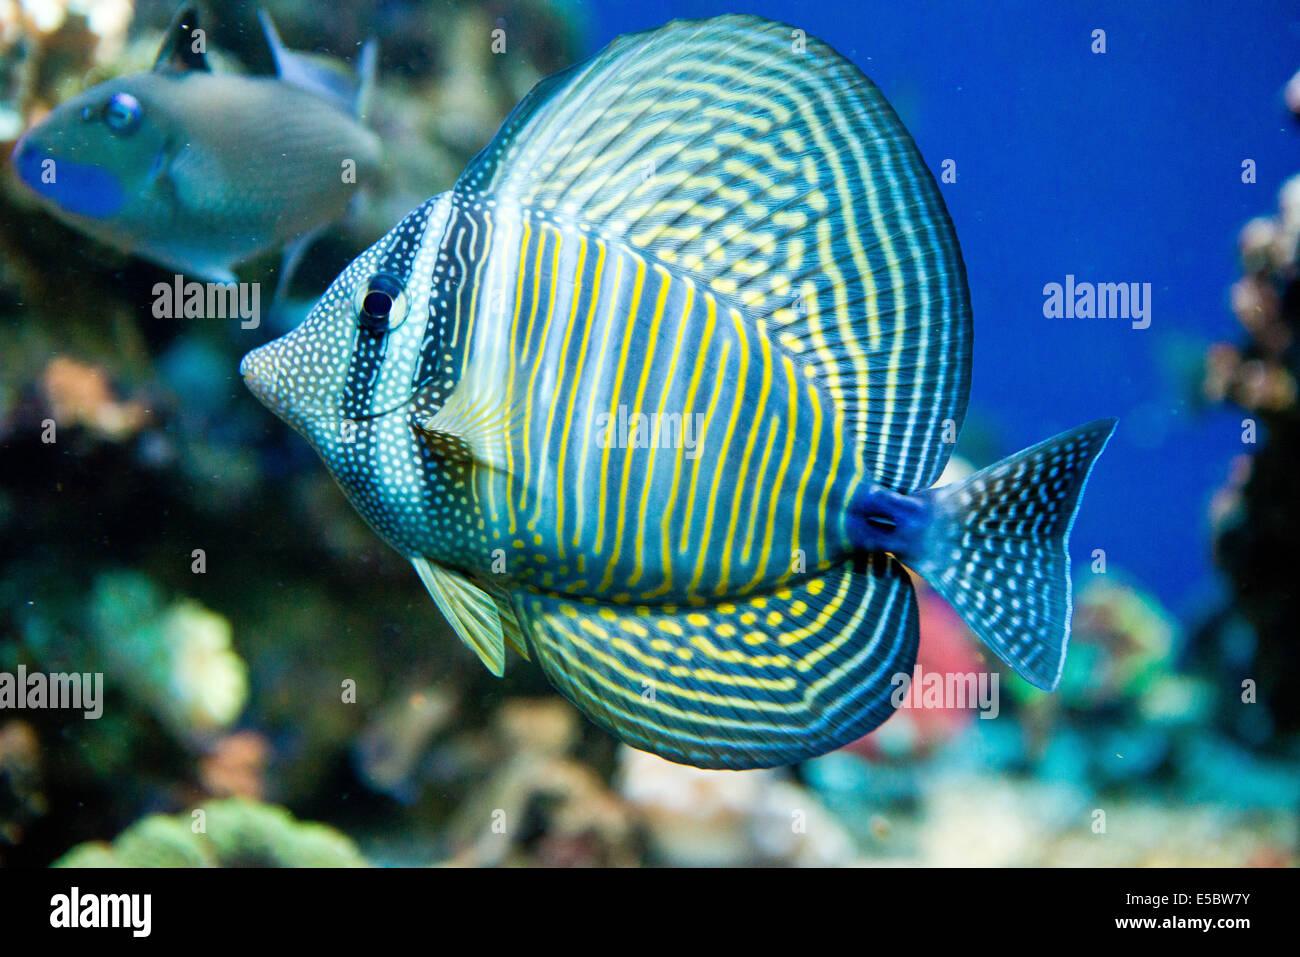 Saltwater Aquarium Fish Zebrasoma Desjardini Stock Photo Alamy